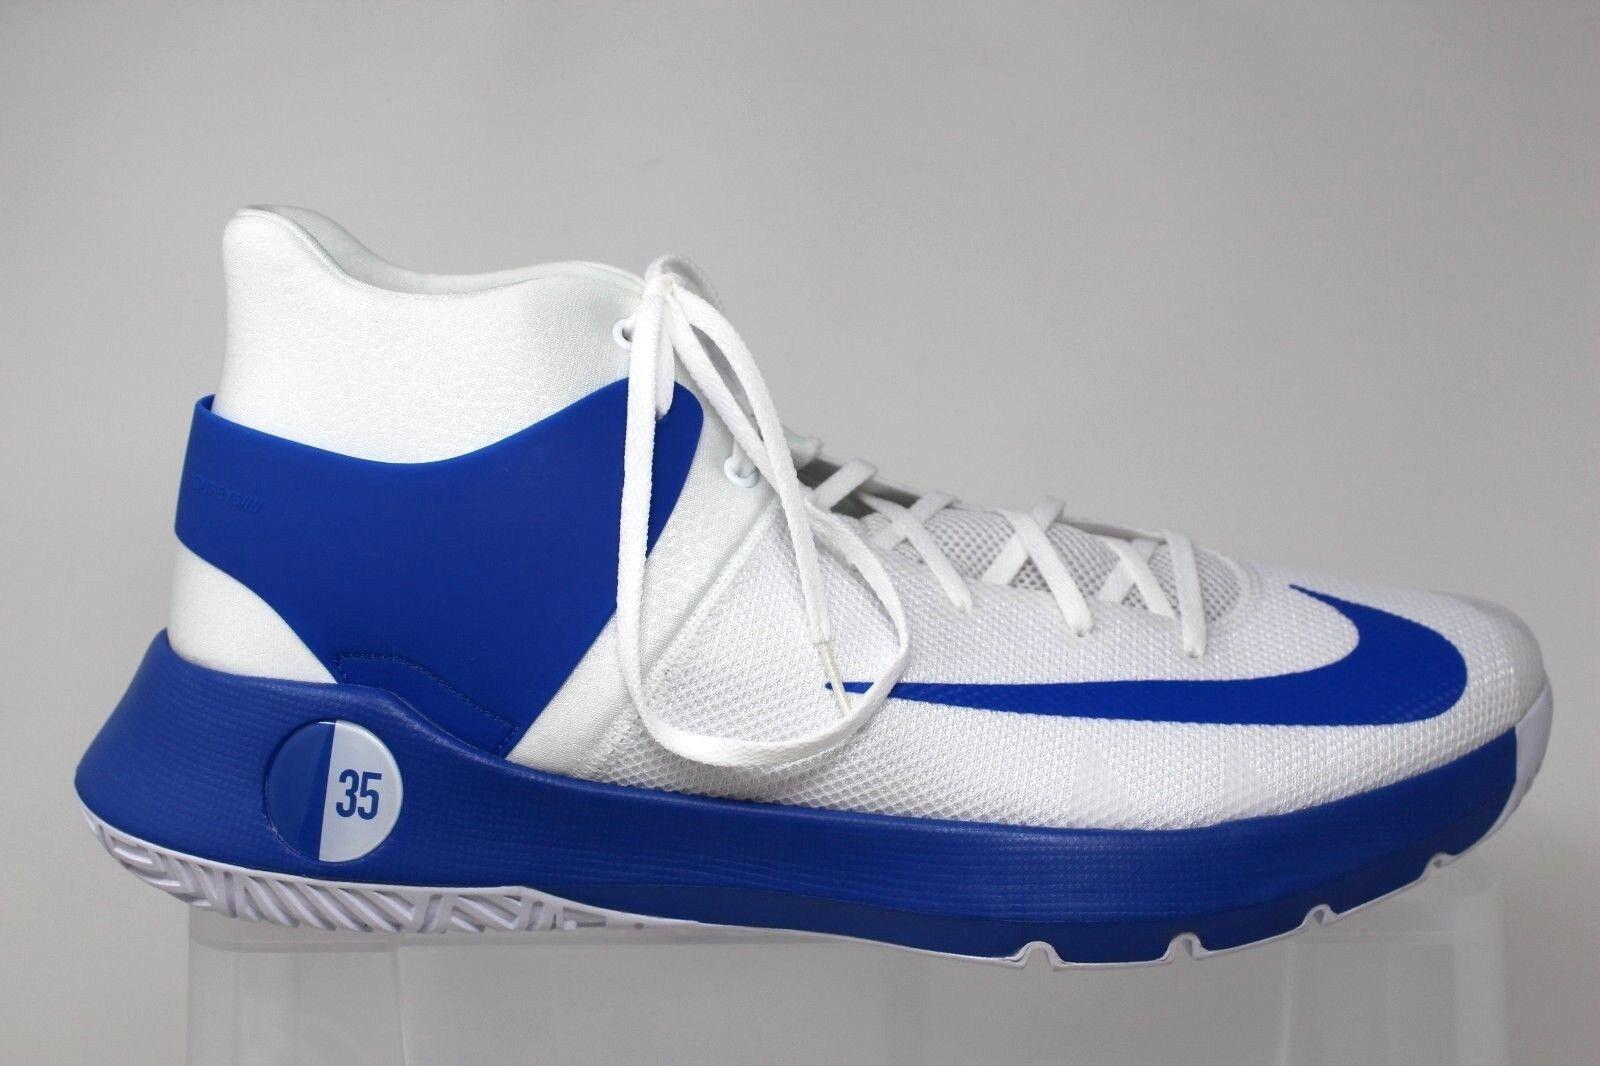 Nike KD Trey 5 IV Durant 856484-140 TB promo Kevin Durant IV Azul Blanco Hombre sz 17 nuevos casual salvaje 3306ff